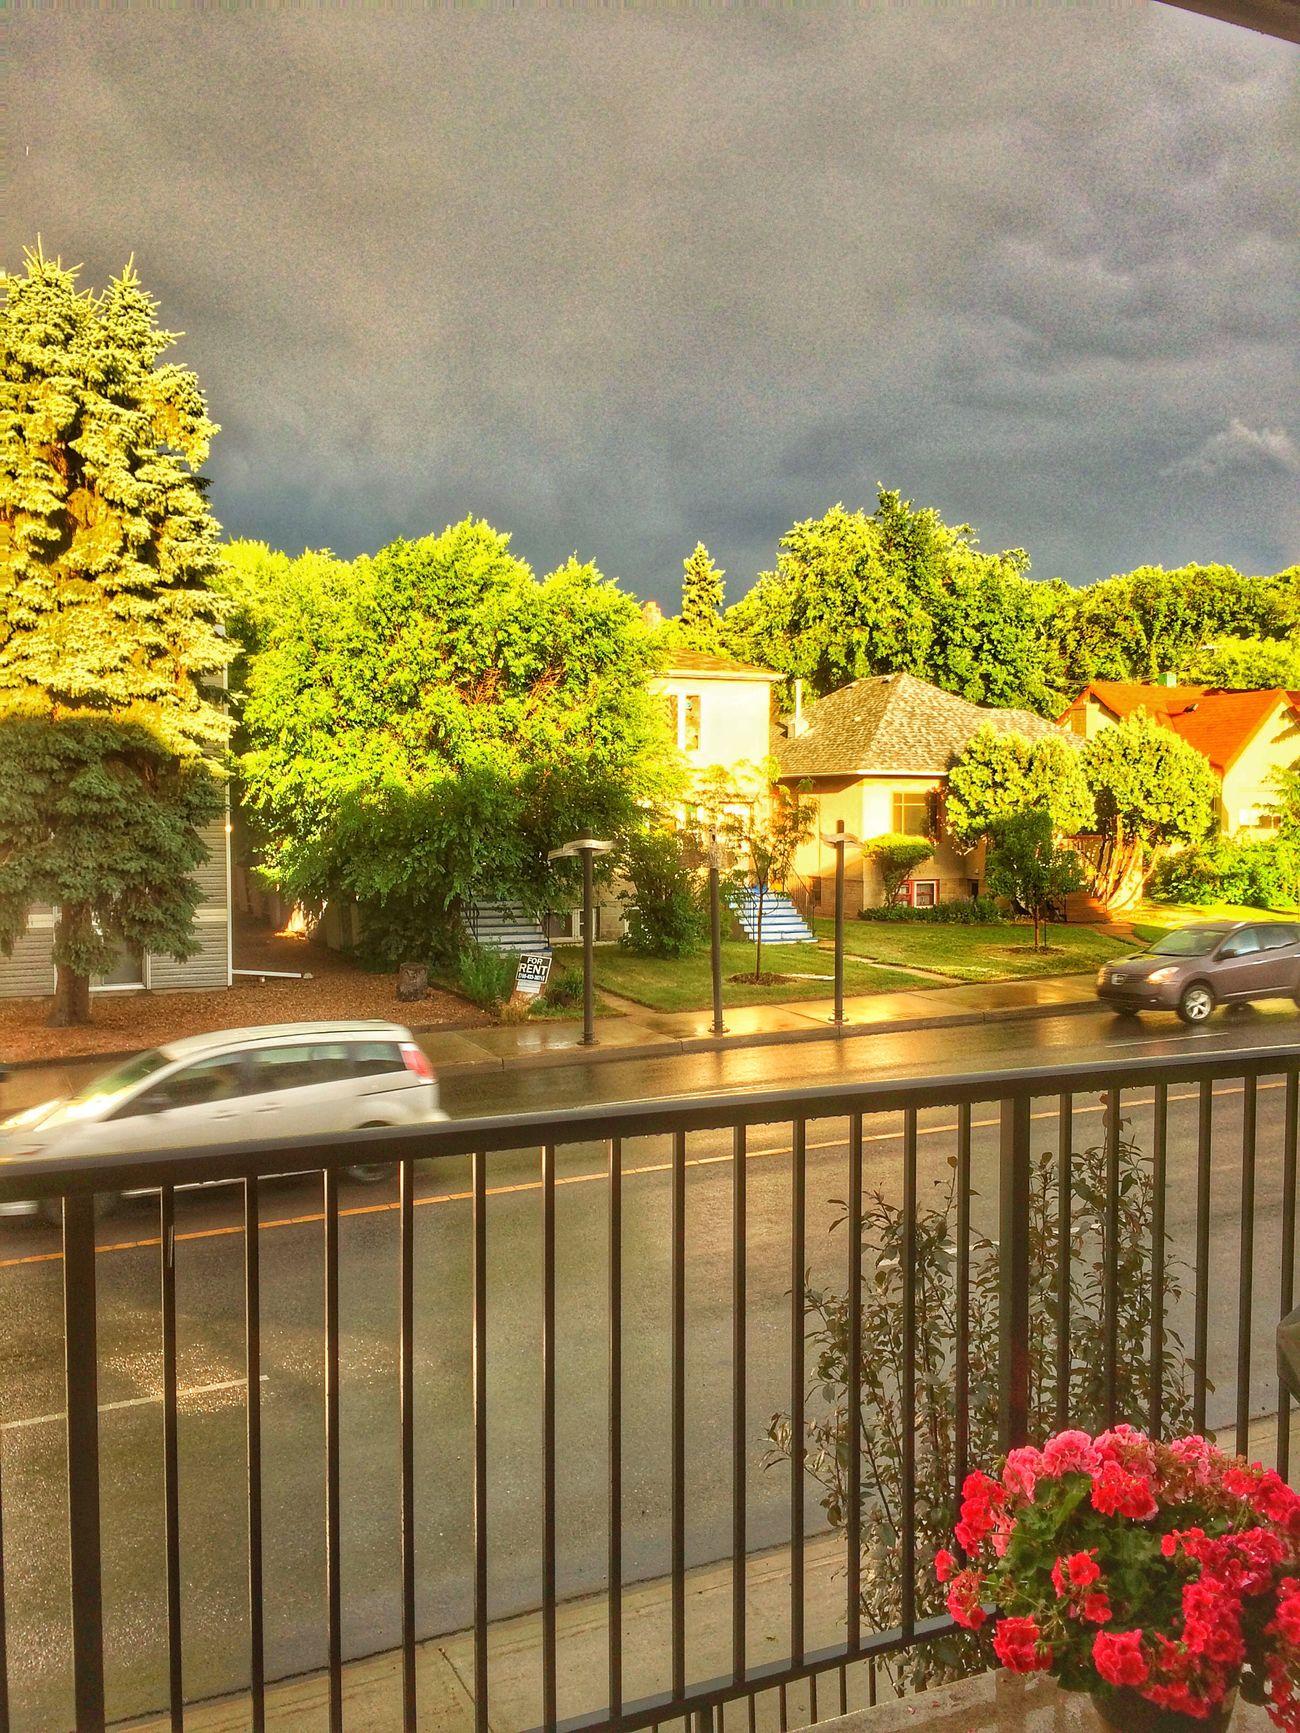 Sun breaks through after a storm. Sky Cloud - Sky Weather Sunlight Street Nature Cityscape